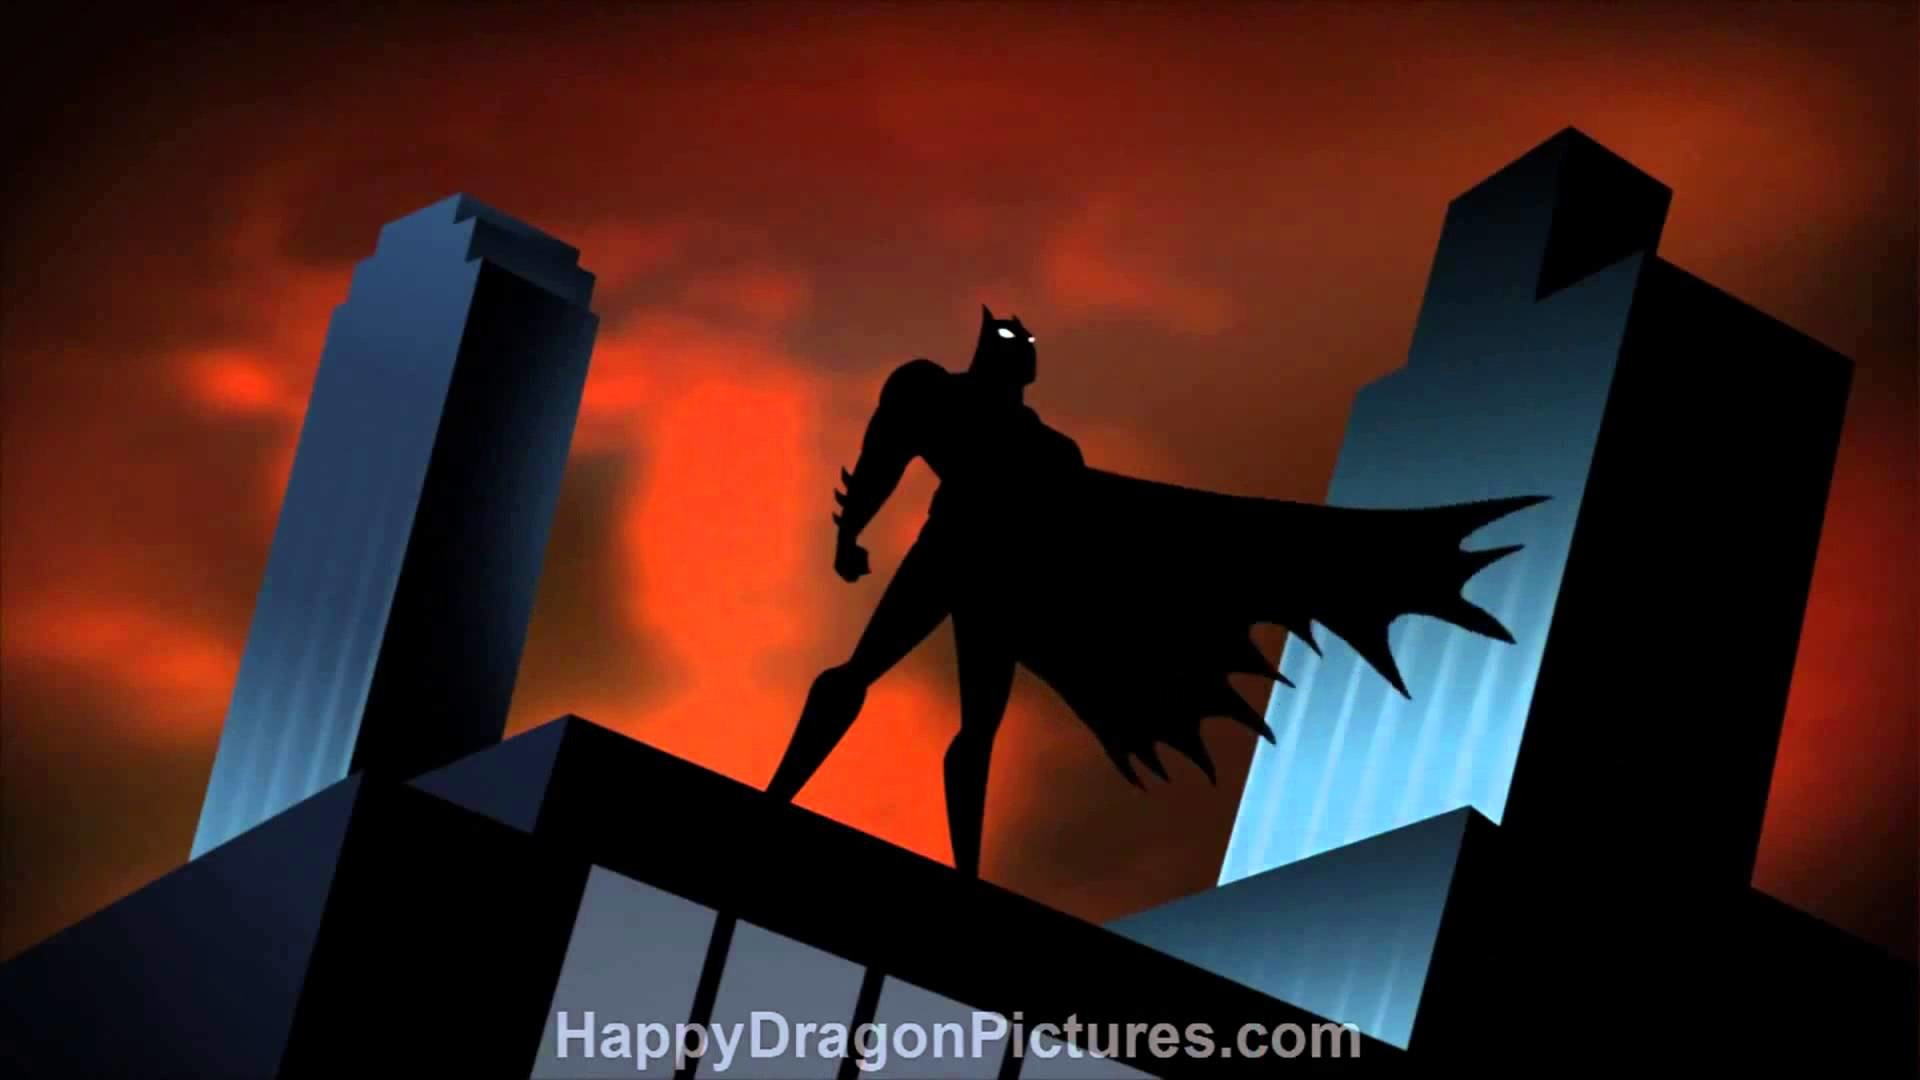 1920x1080 Batman HD Desktop Mobile Wallpaper Profile Image The Animated Series